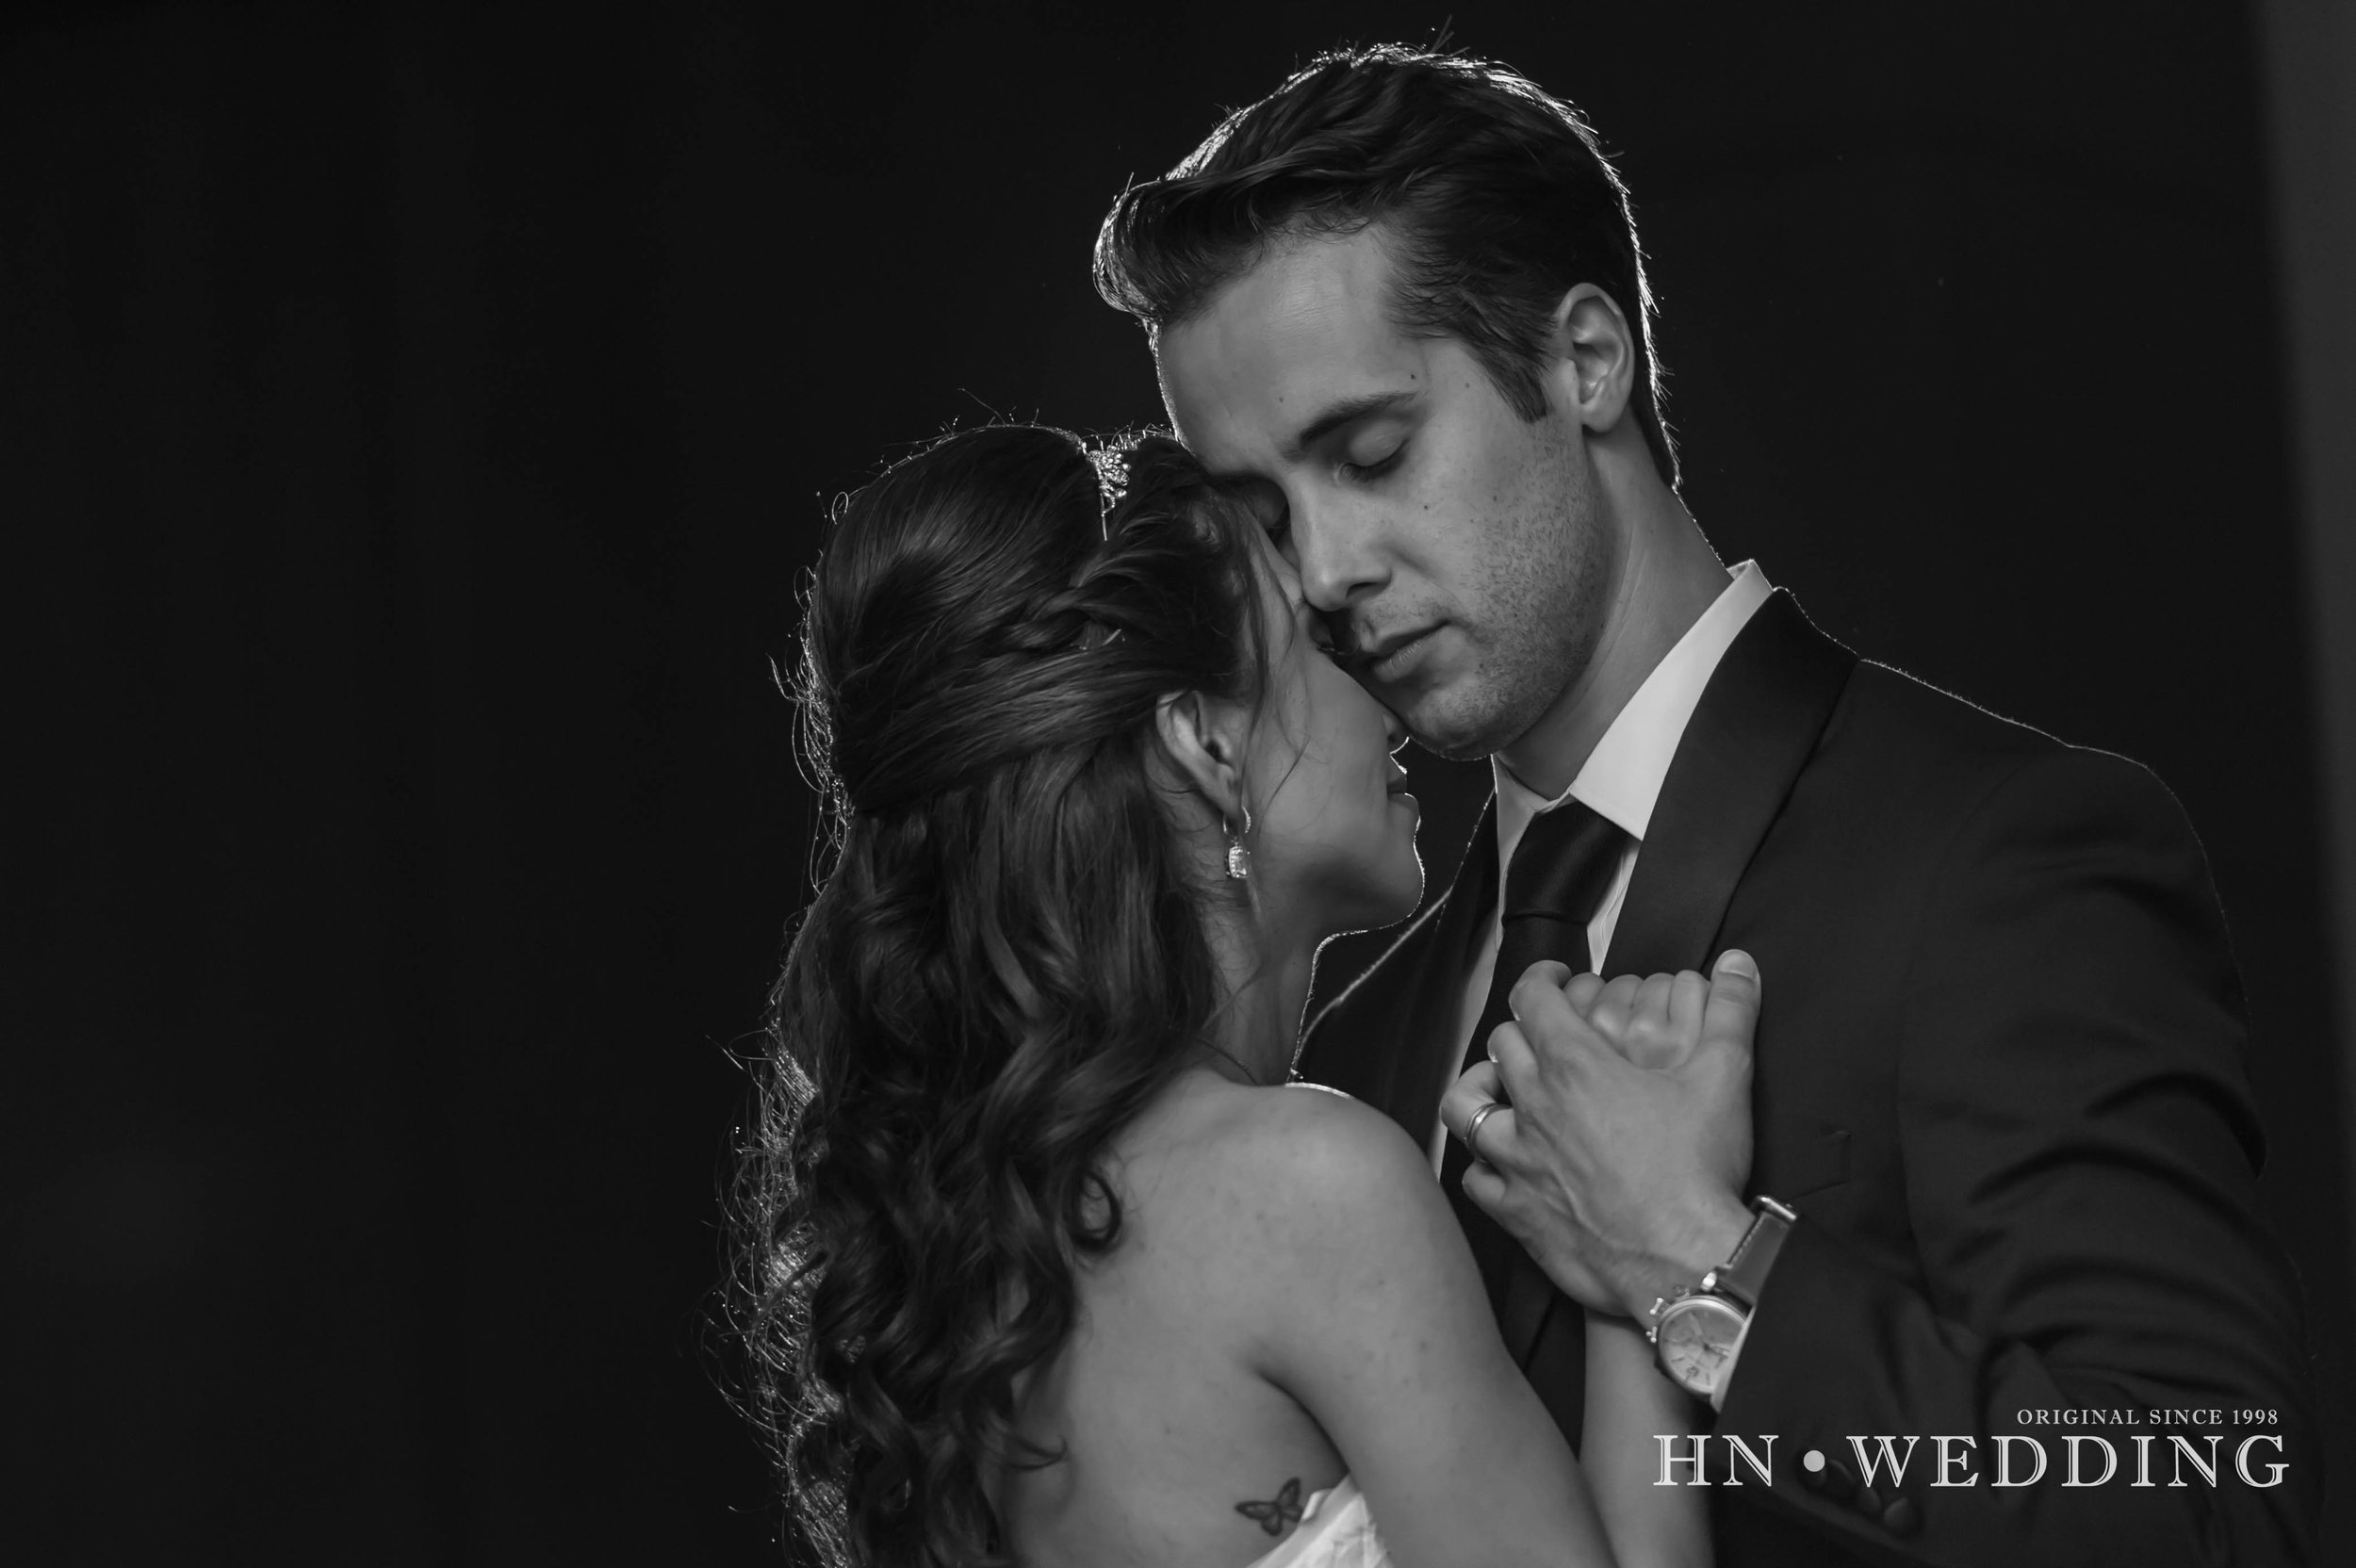 HNwedding-20161012-wedding-9370.jpg